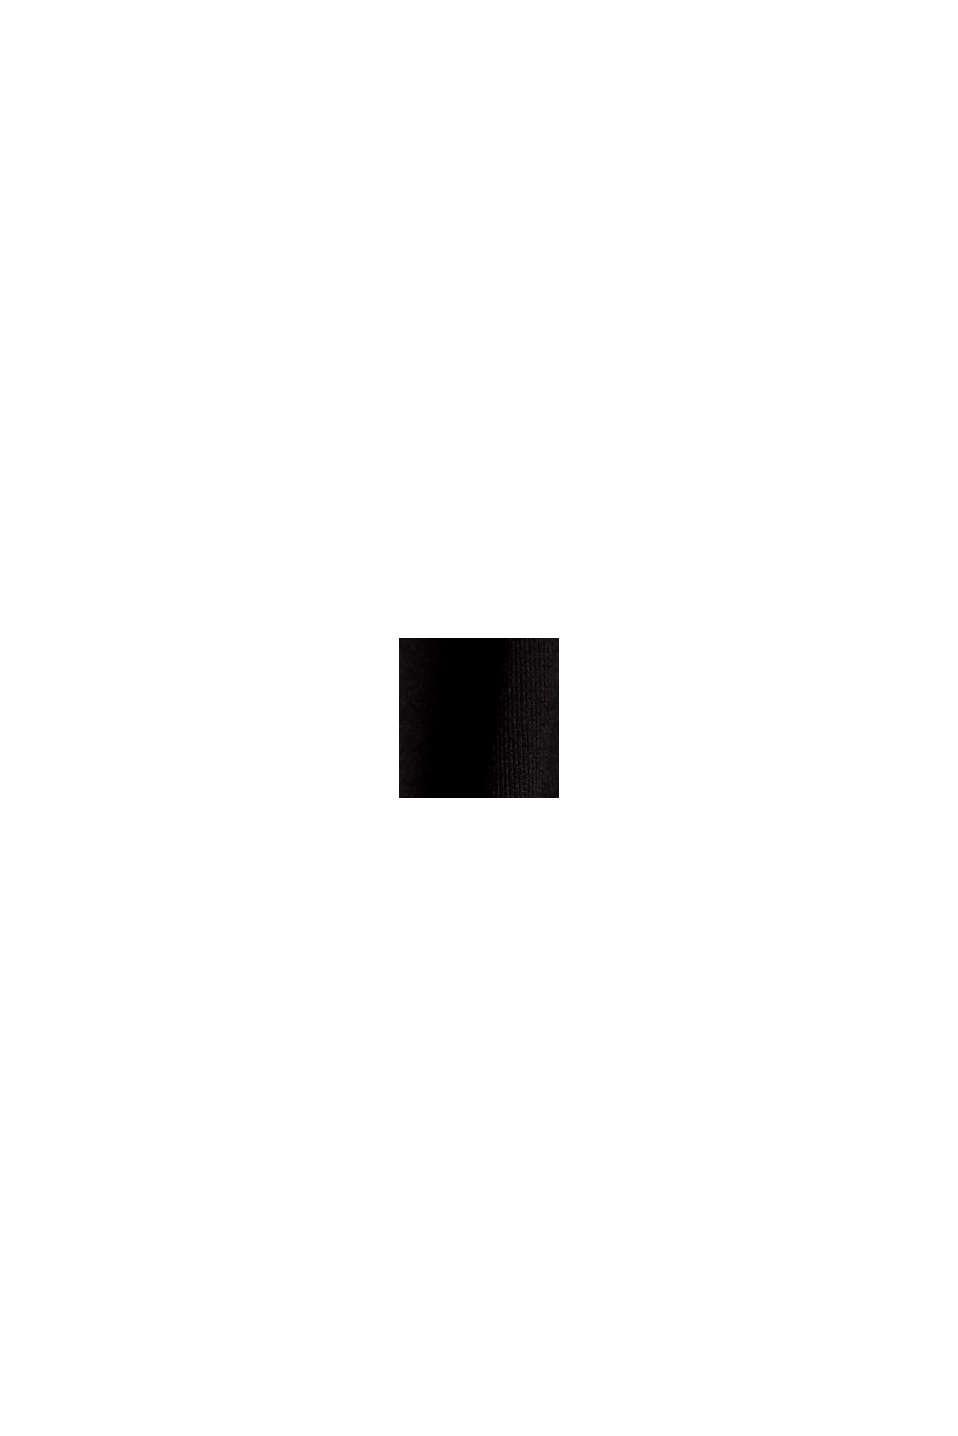 Body met knoopbandjes, LENZING™ ECOVERO™, BLACK, swatch